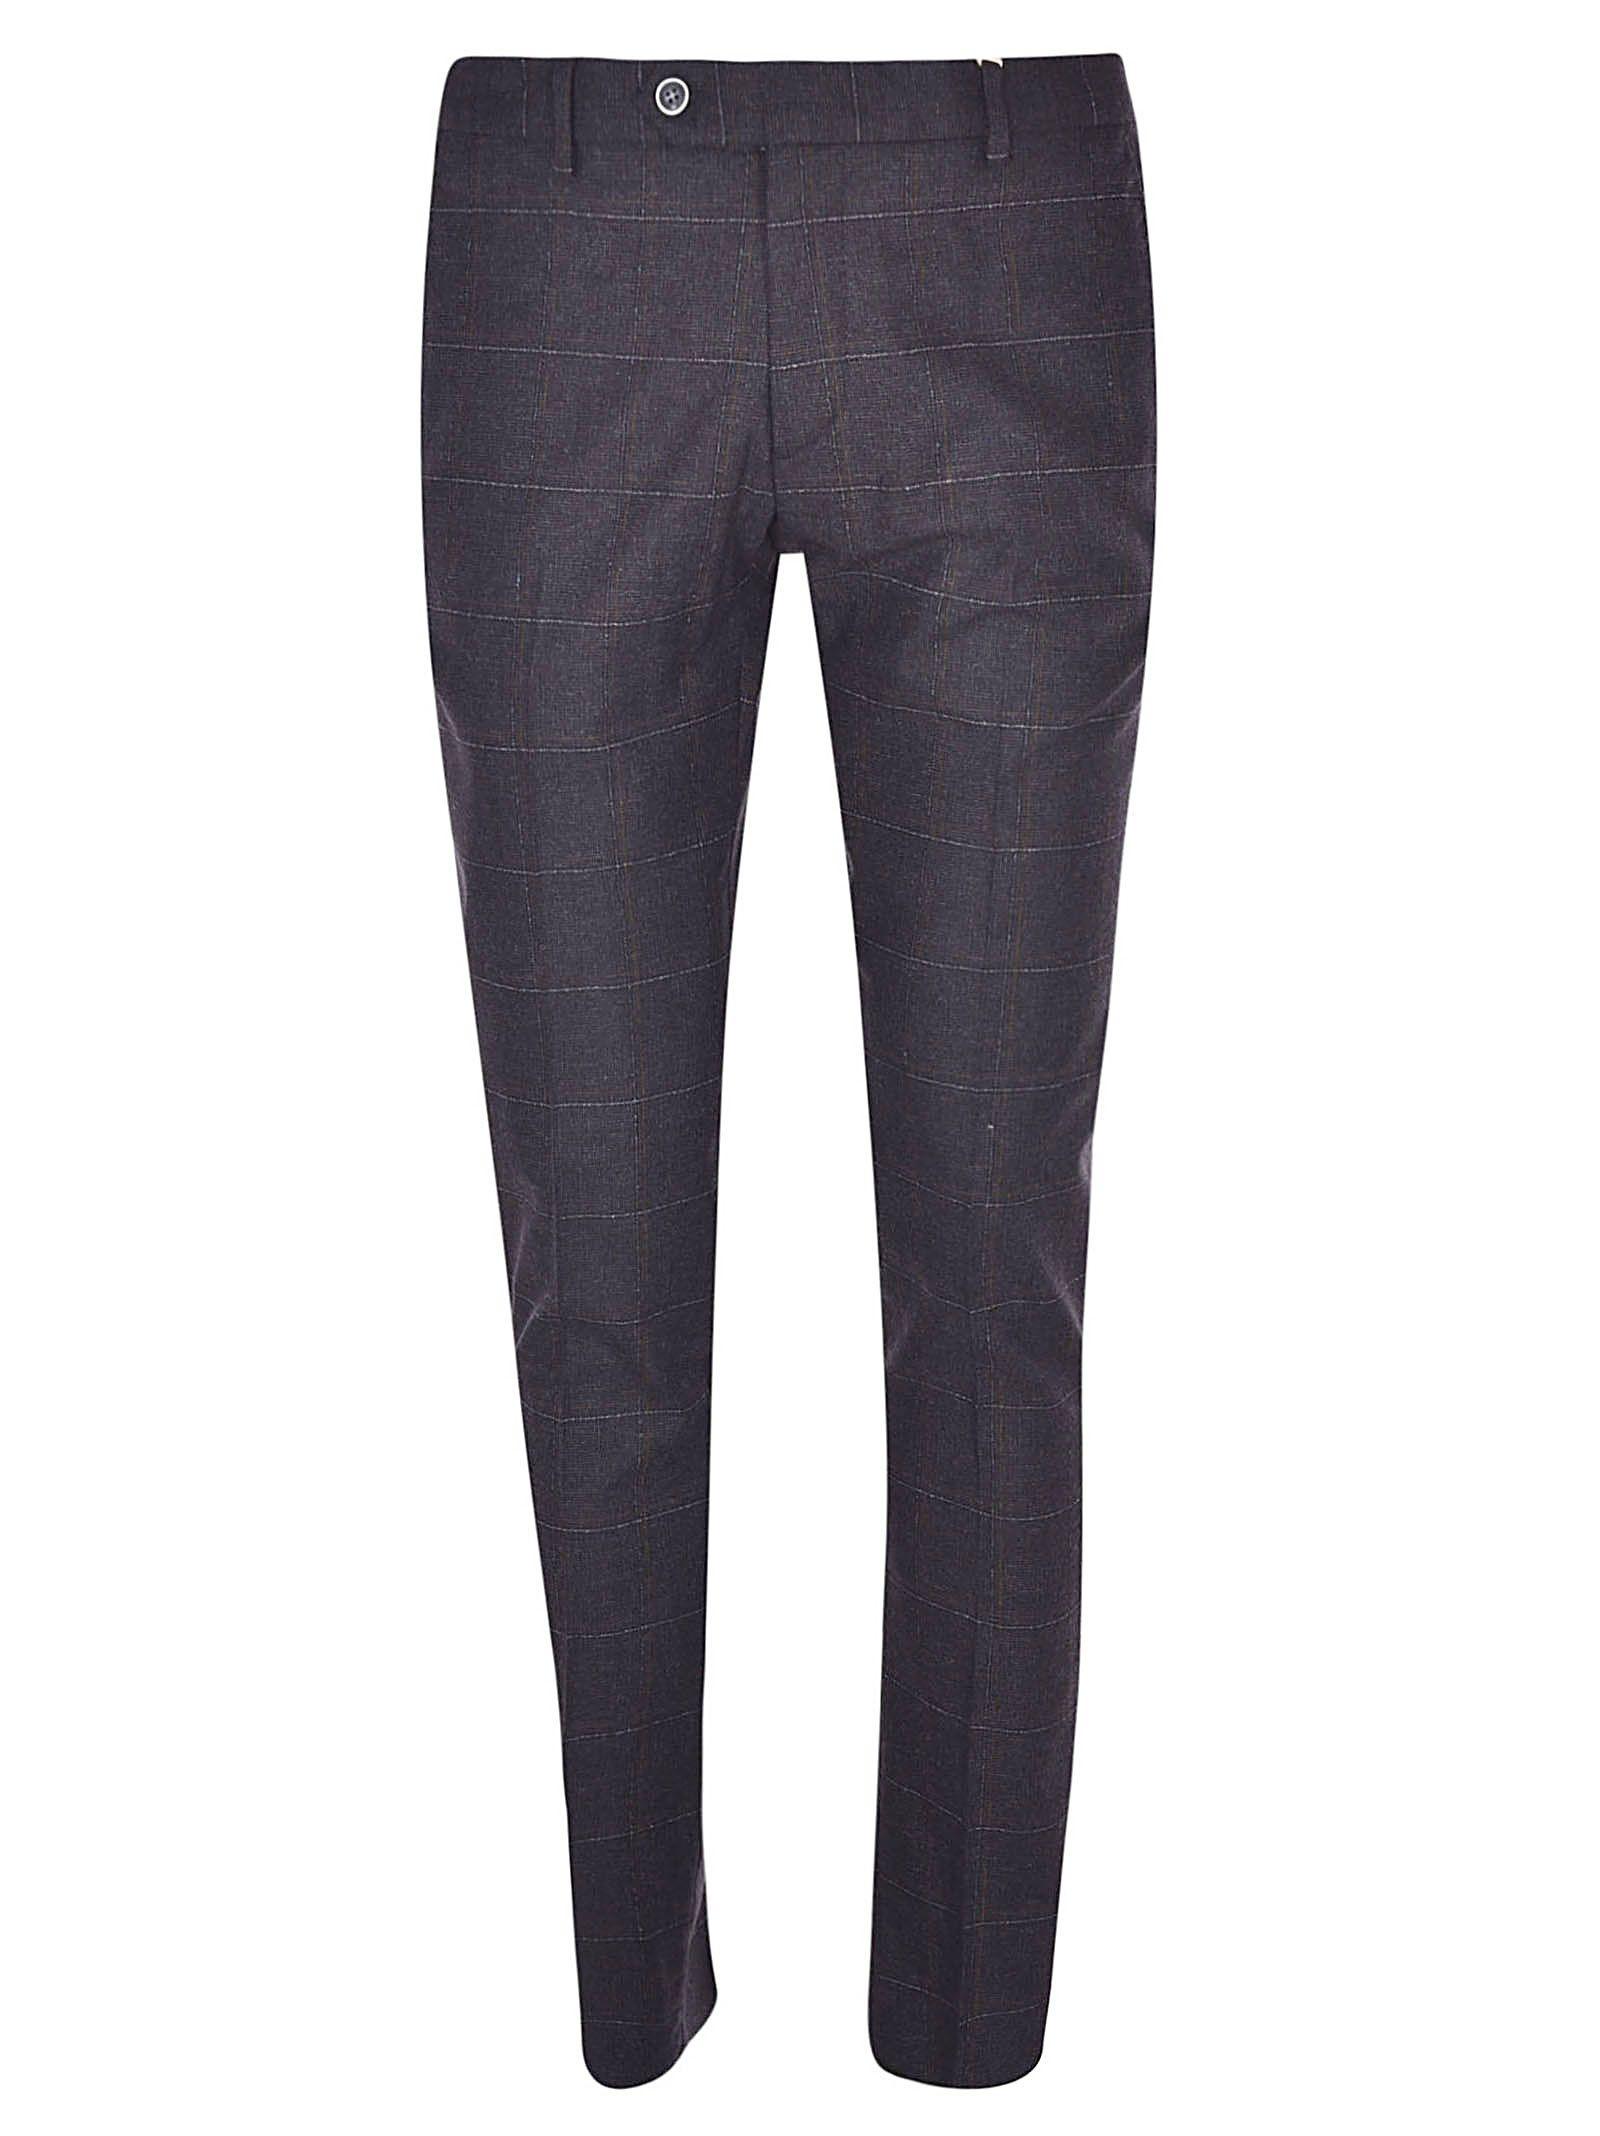 LUIGI BIANCHI MANTOVA Check Trousers in U